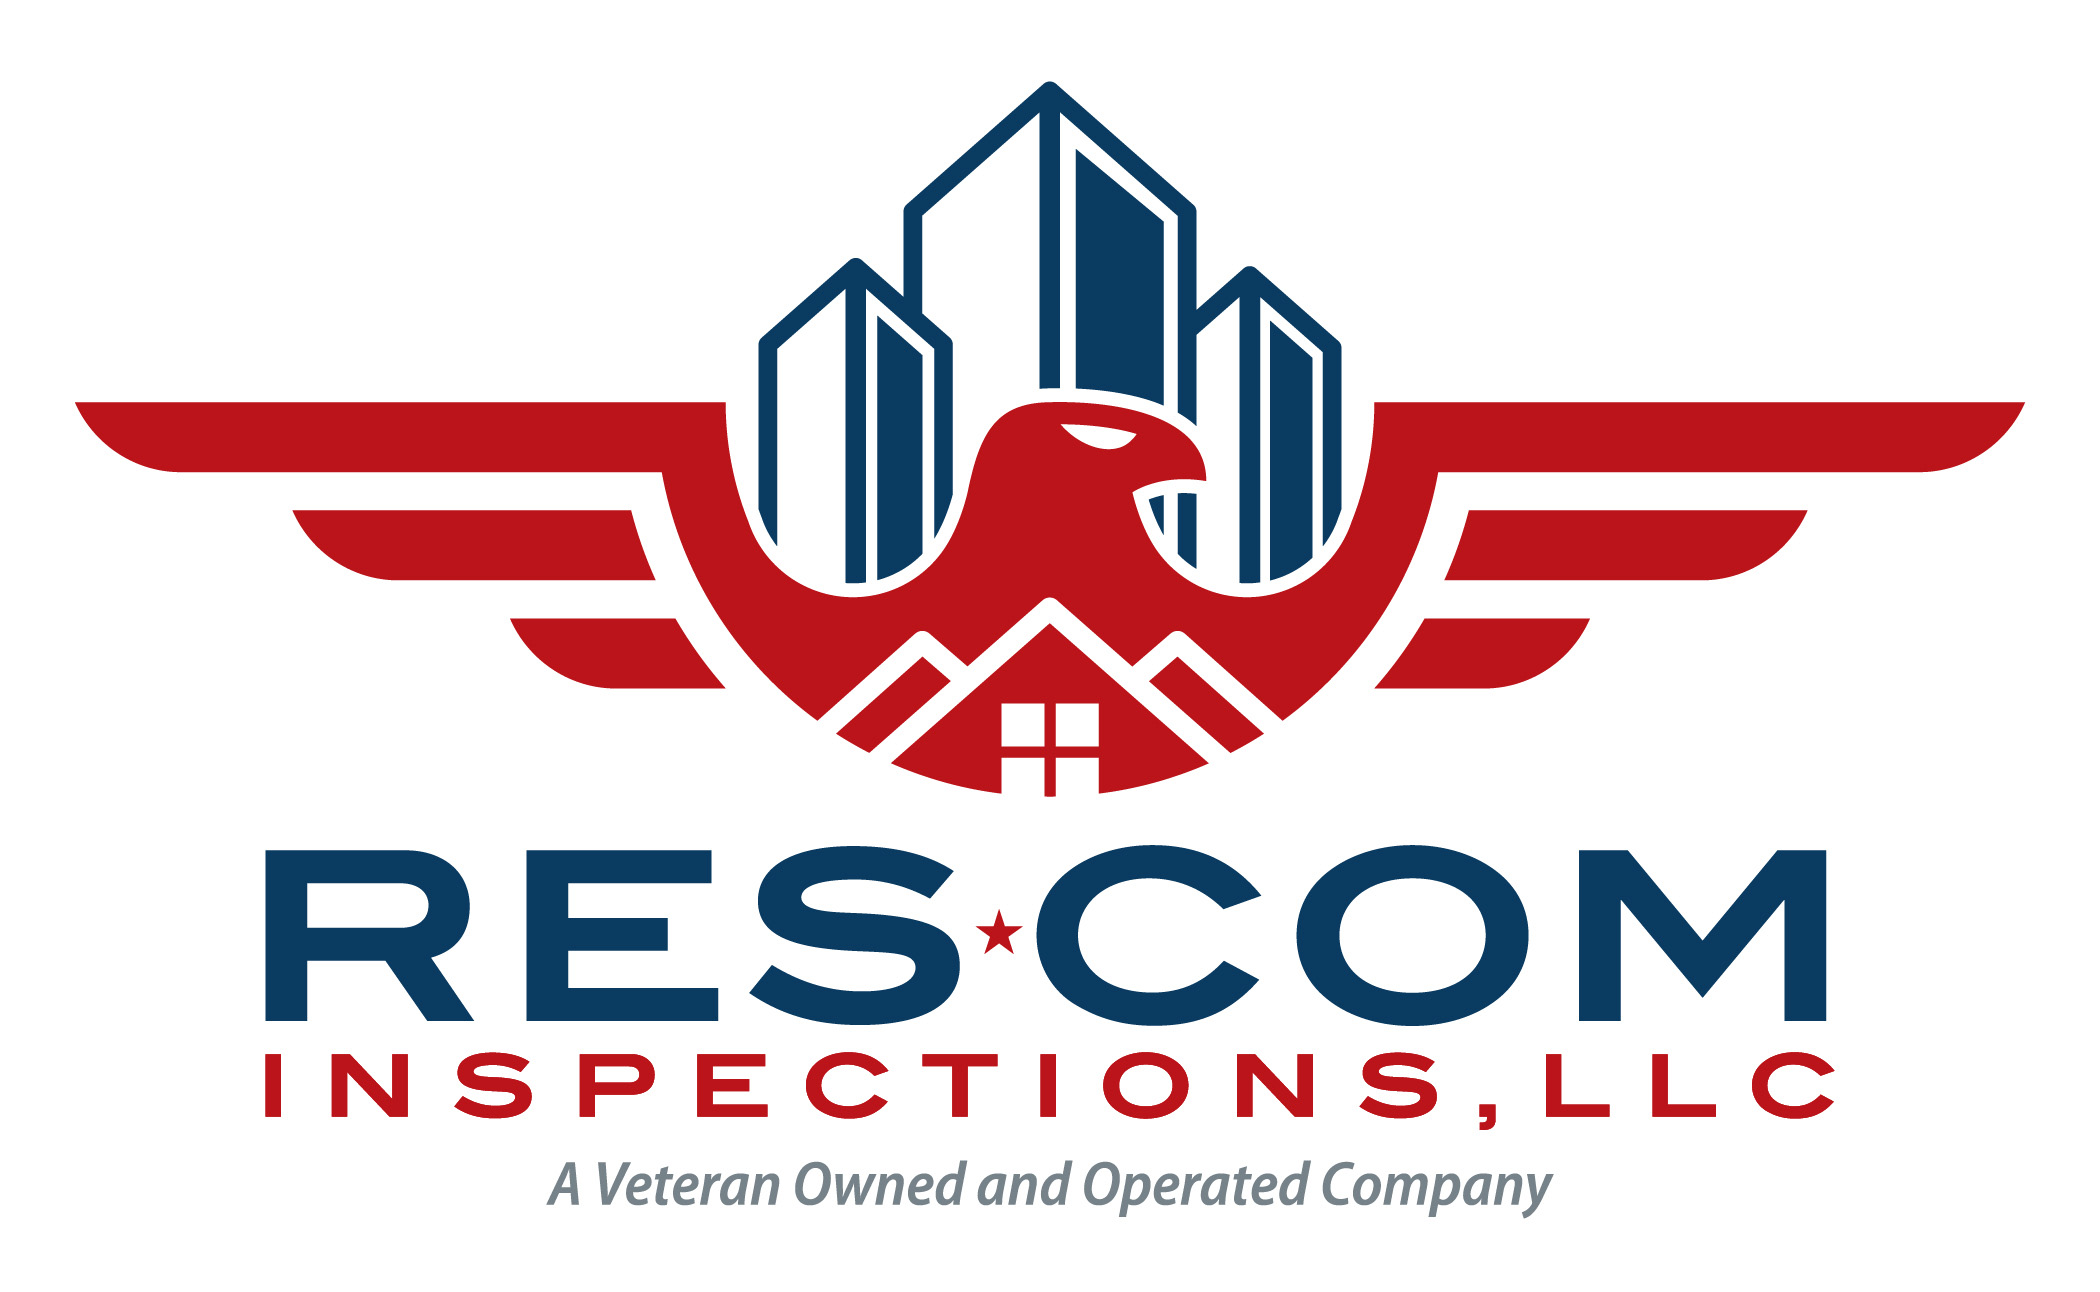 Rescom Inspections